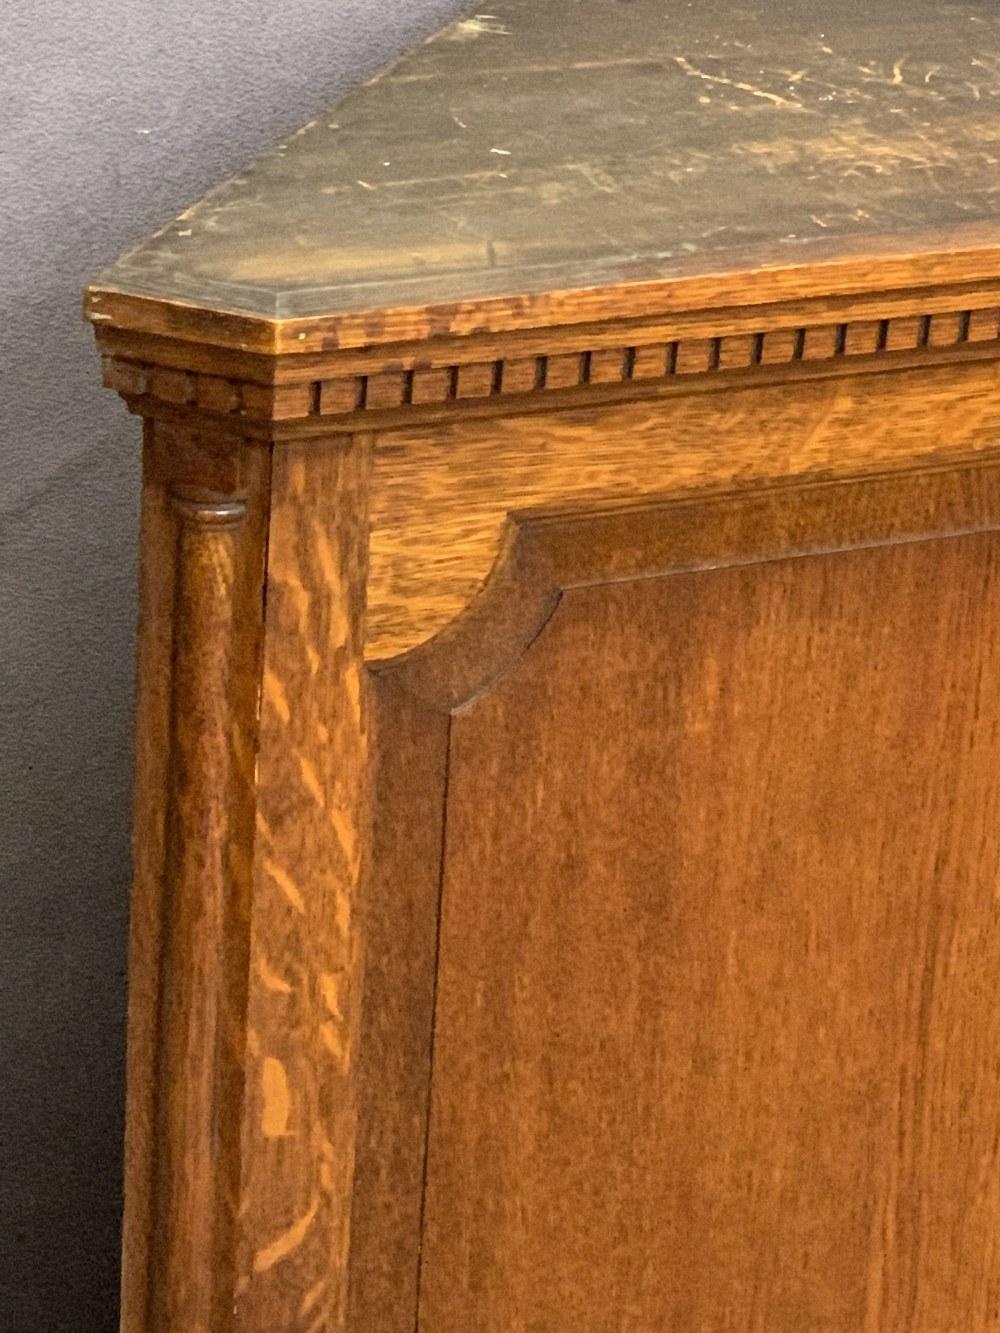 VINTAGE OAK WALL HANGING CORNER CUPBOARD having a dentil cornice and quarter cut pillars flanking - Image 2 of 4